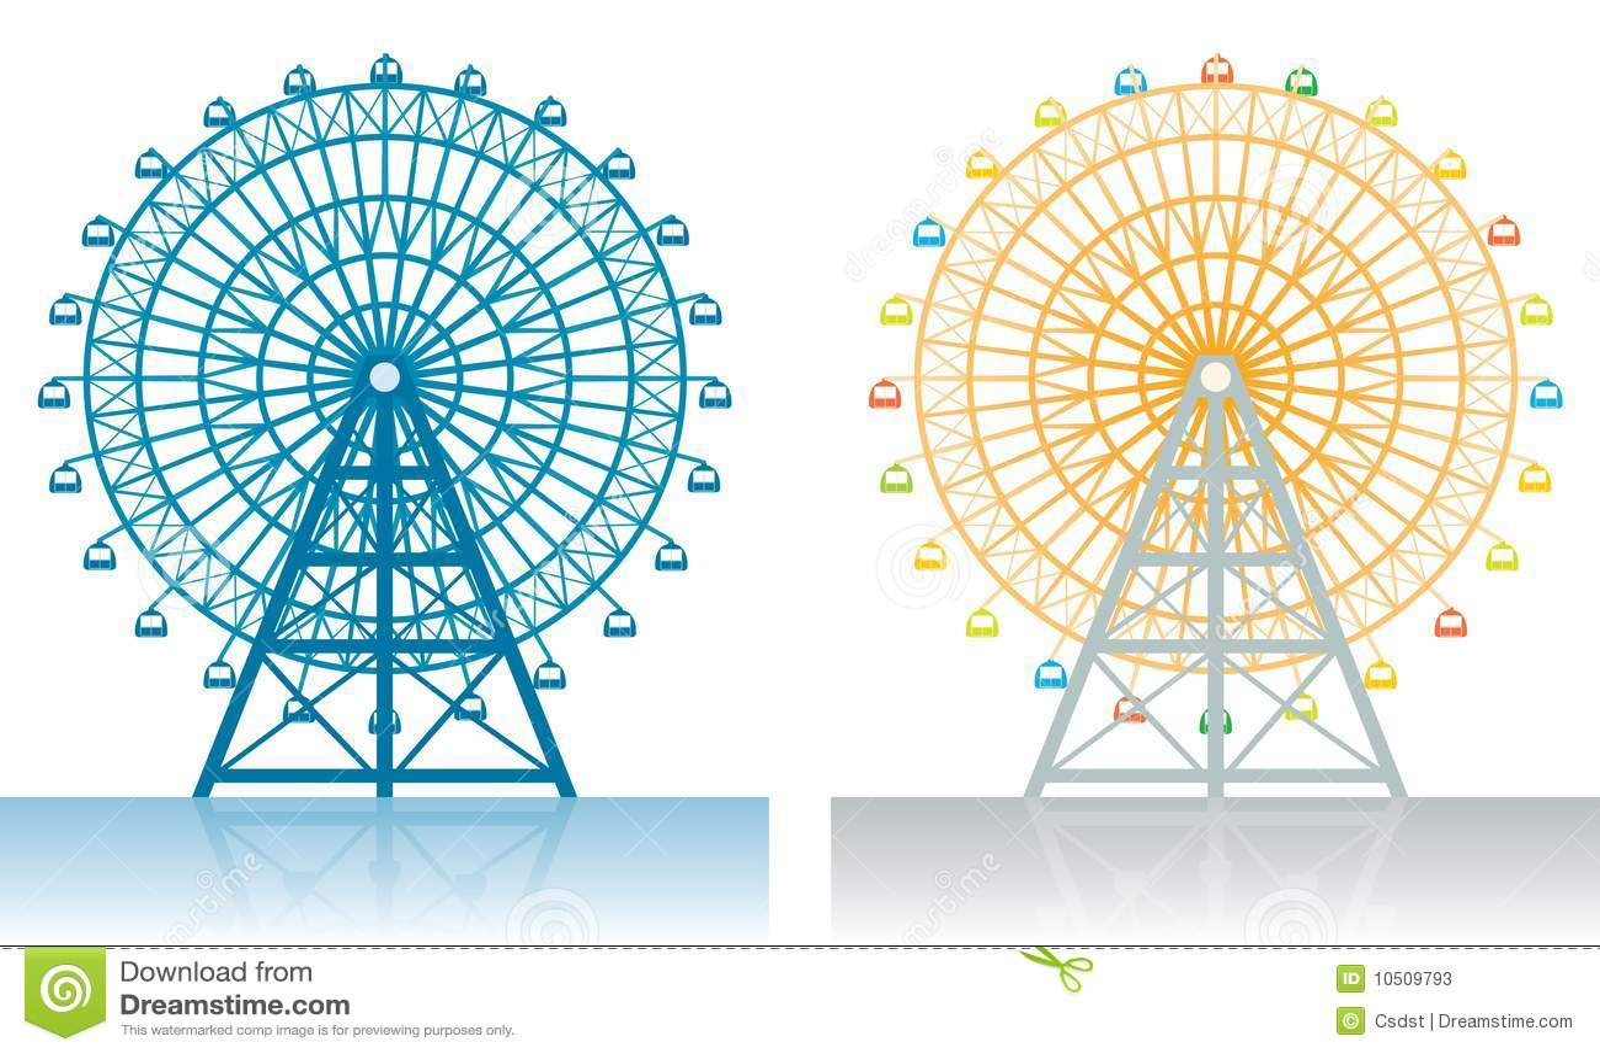 Credit Cards For Fair Credit >> Ferris Wheel Stock Photos - Image: 10509793